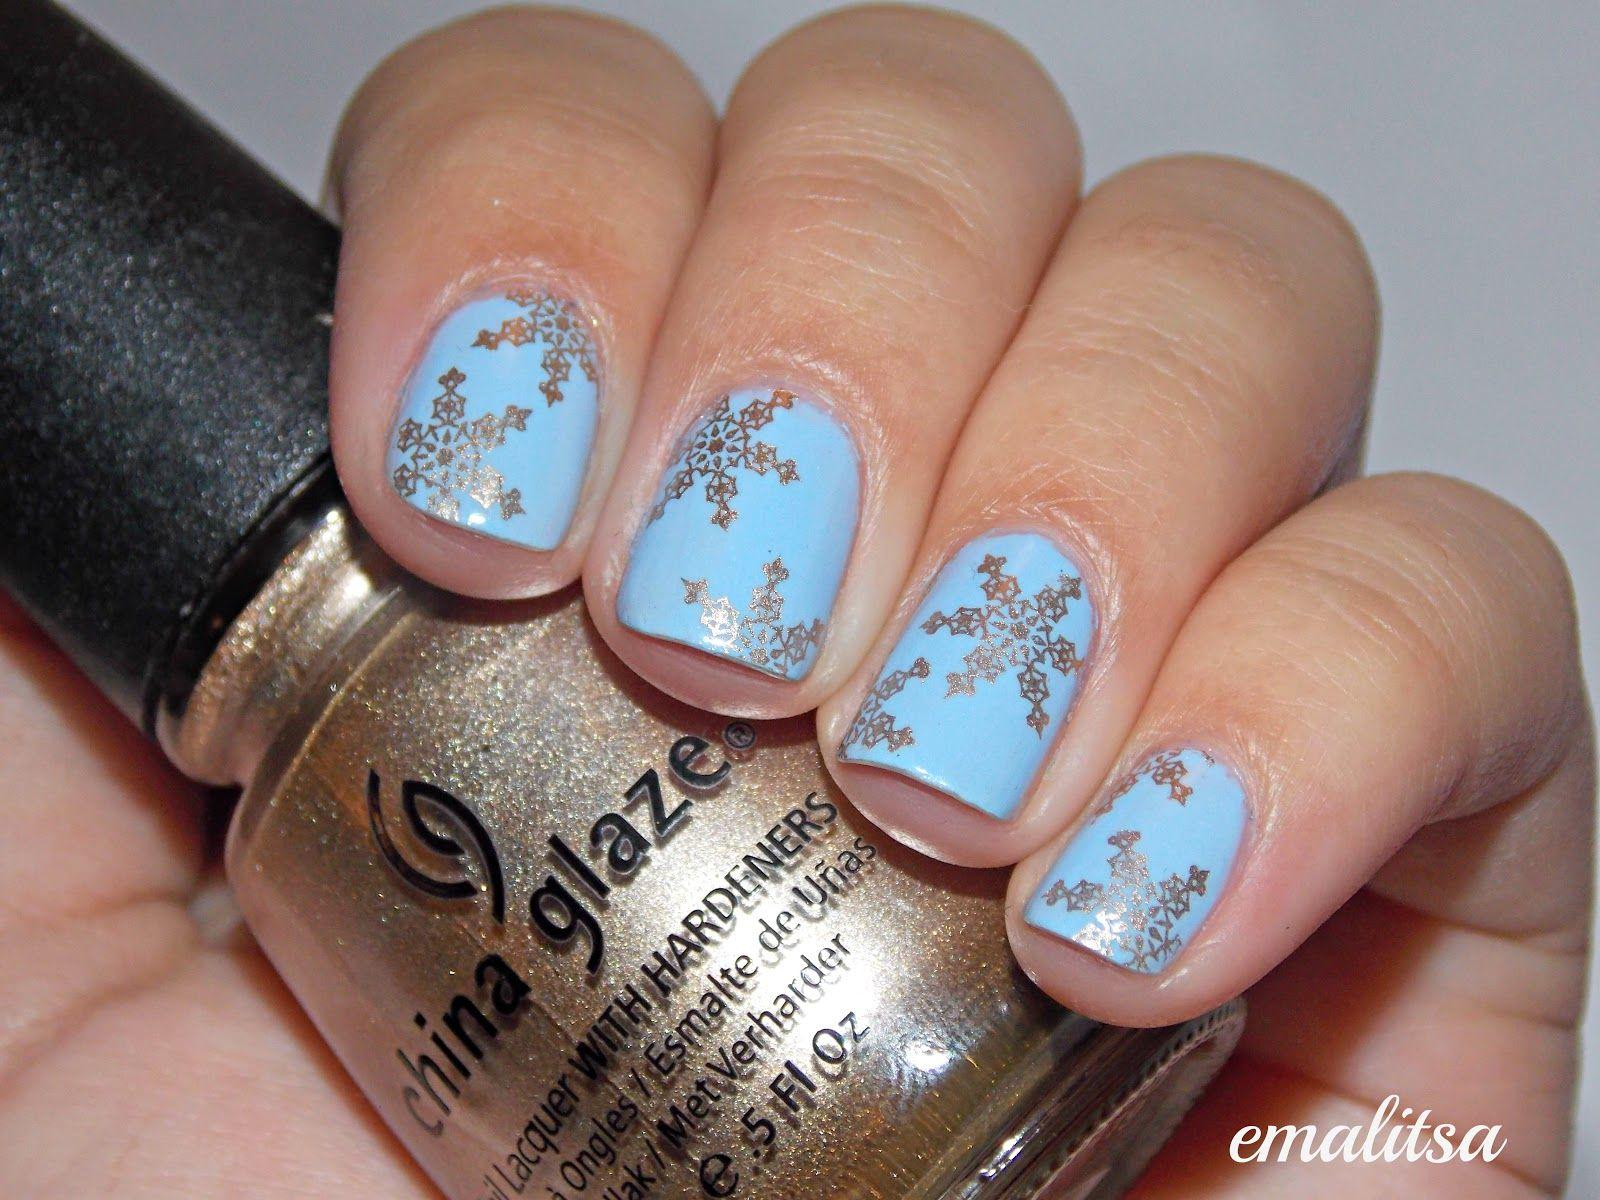 Konad Nail Art Konad Nail Art Designs Nails Pinterest